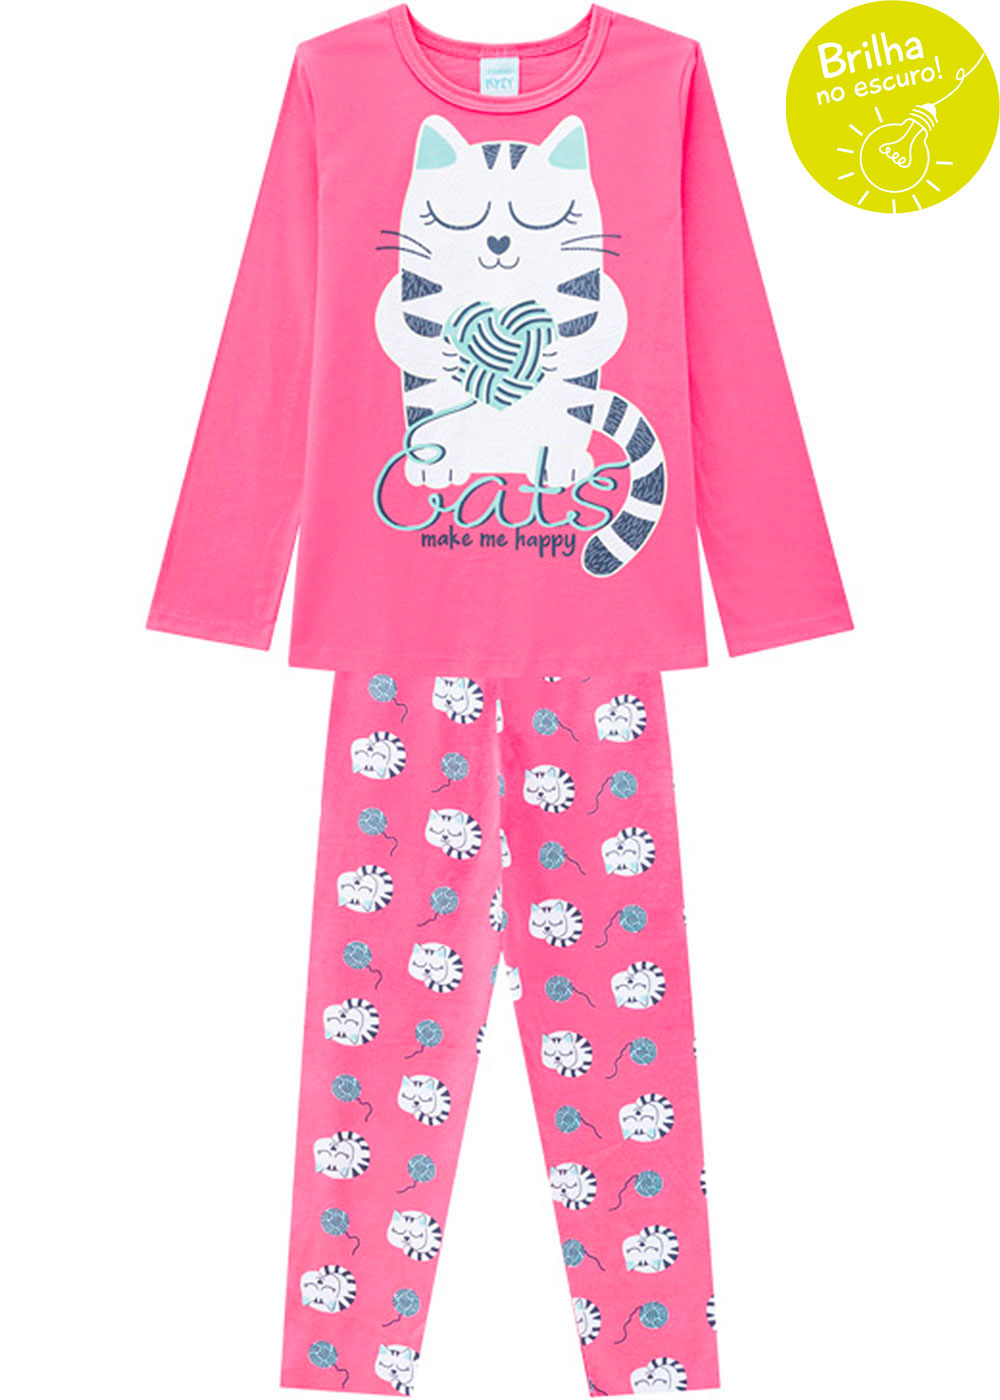 Pijama Infantil Feminino Inverno Brilha no Escuro Cats Rosa Kyly